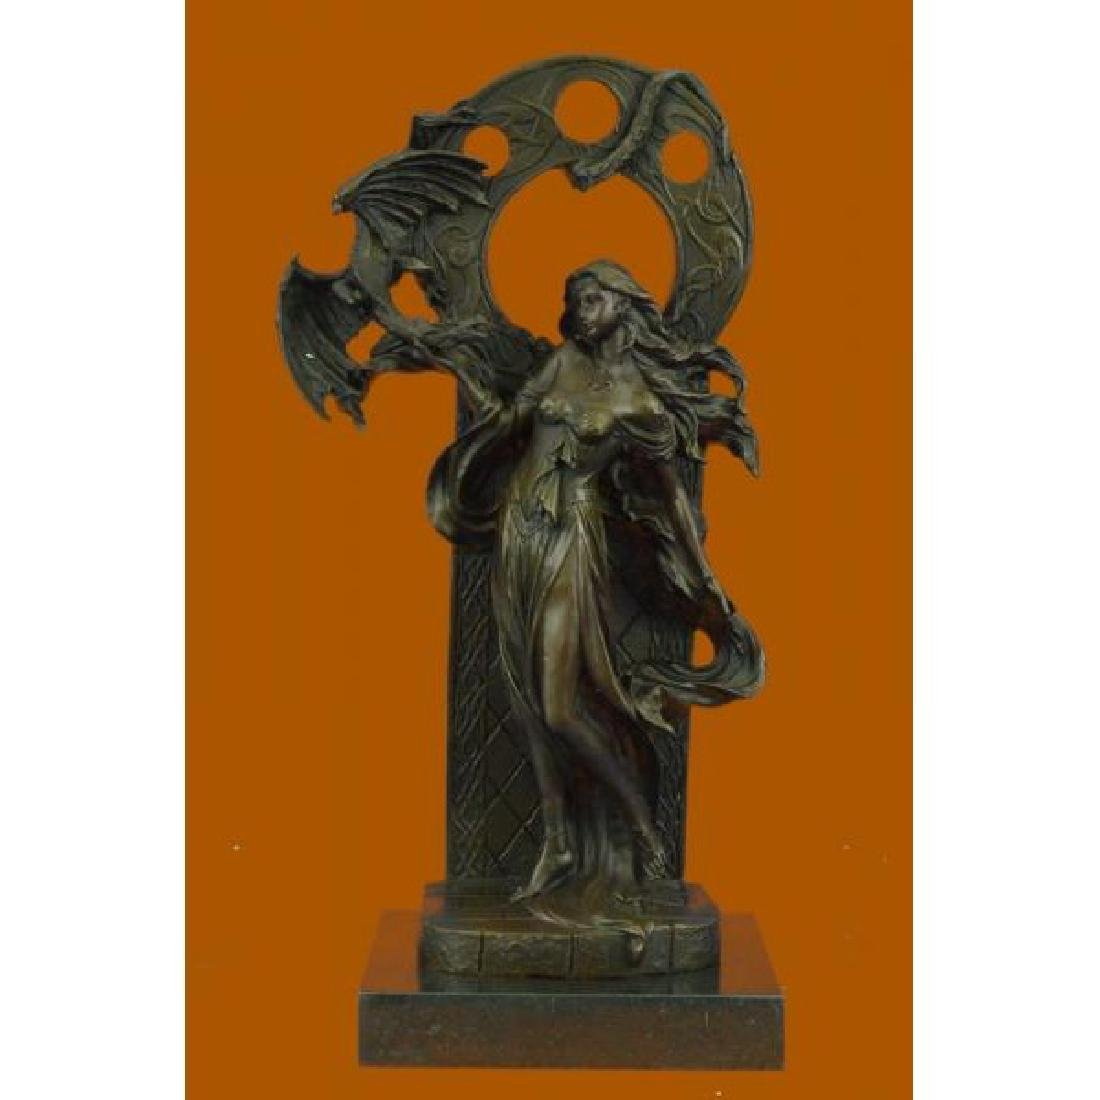 Dragon Girl French Artist Jean Patoue Bronze Sculpture